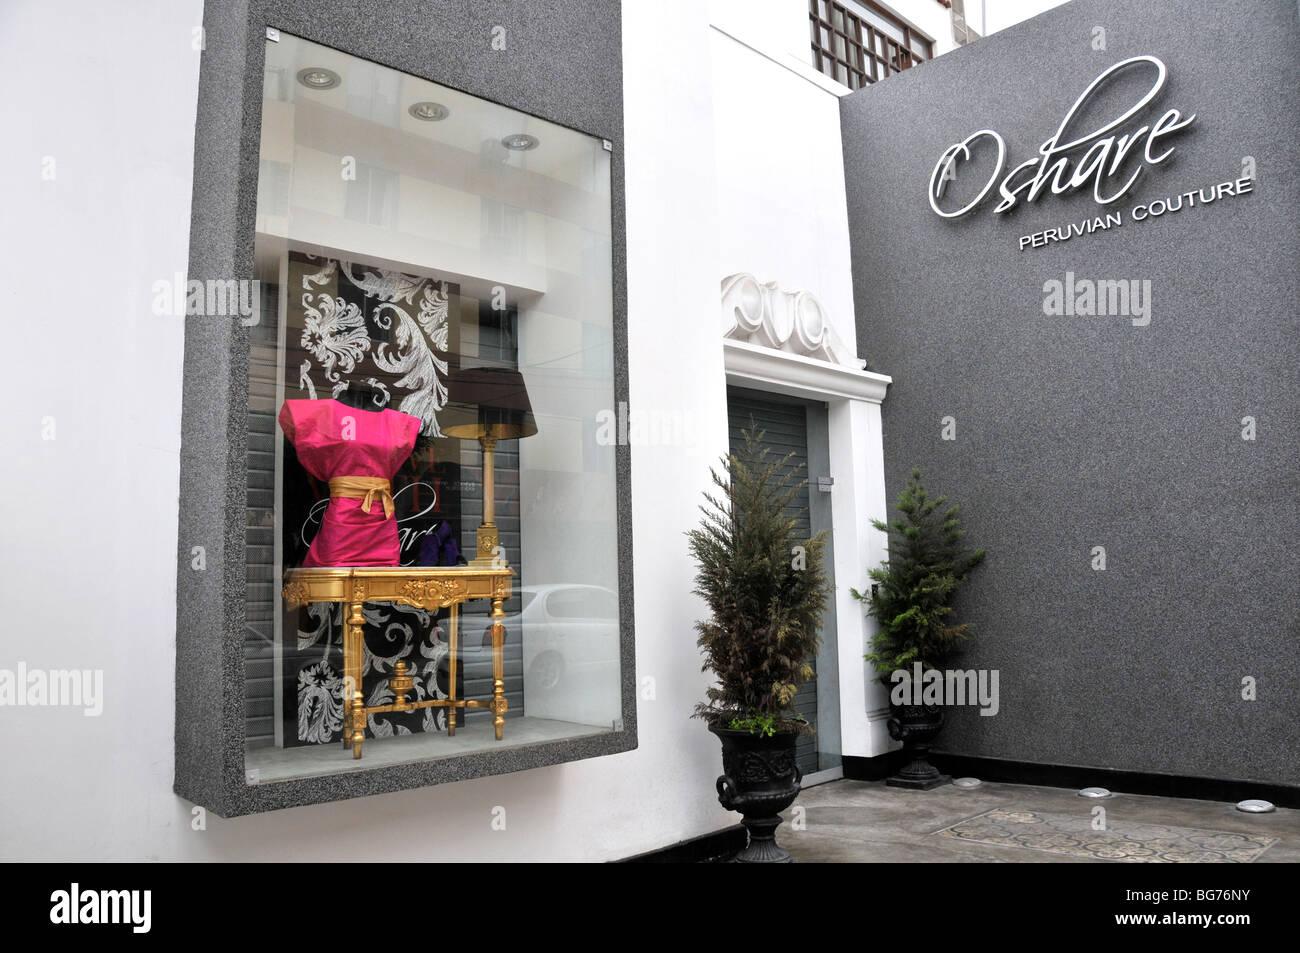 luxury mode shop, Oshare peruvian couture, Lima, Peru - Stock Image